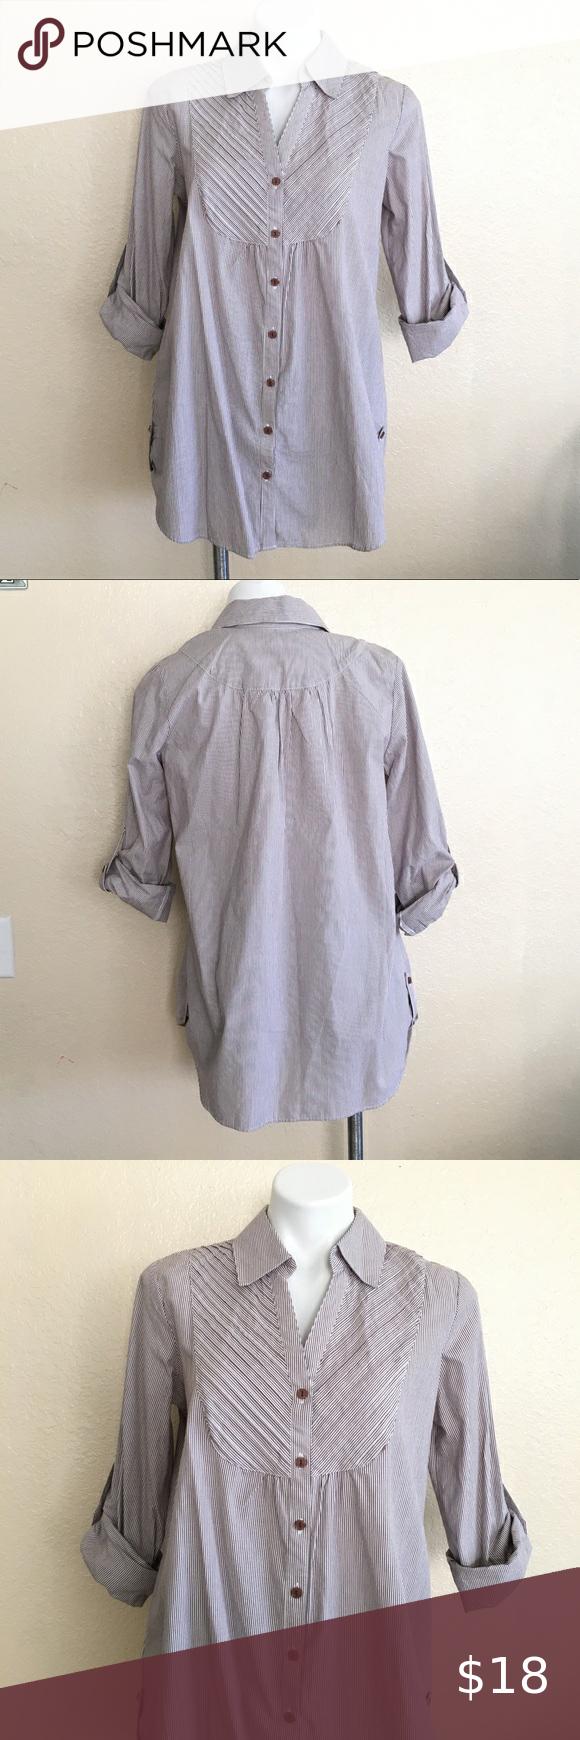 Passport Long Sleeve Shirt Size L Long Sleeve Shirts Shirt Size Sleeves